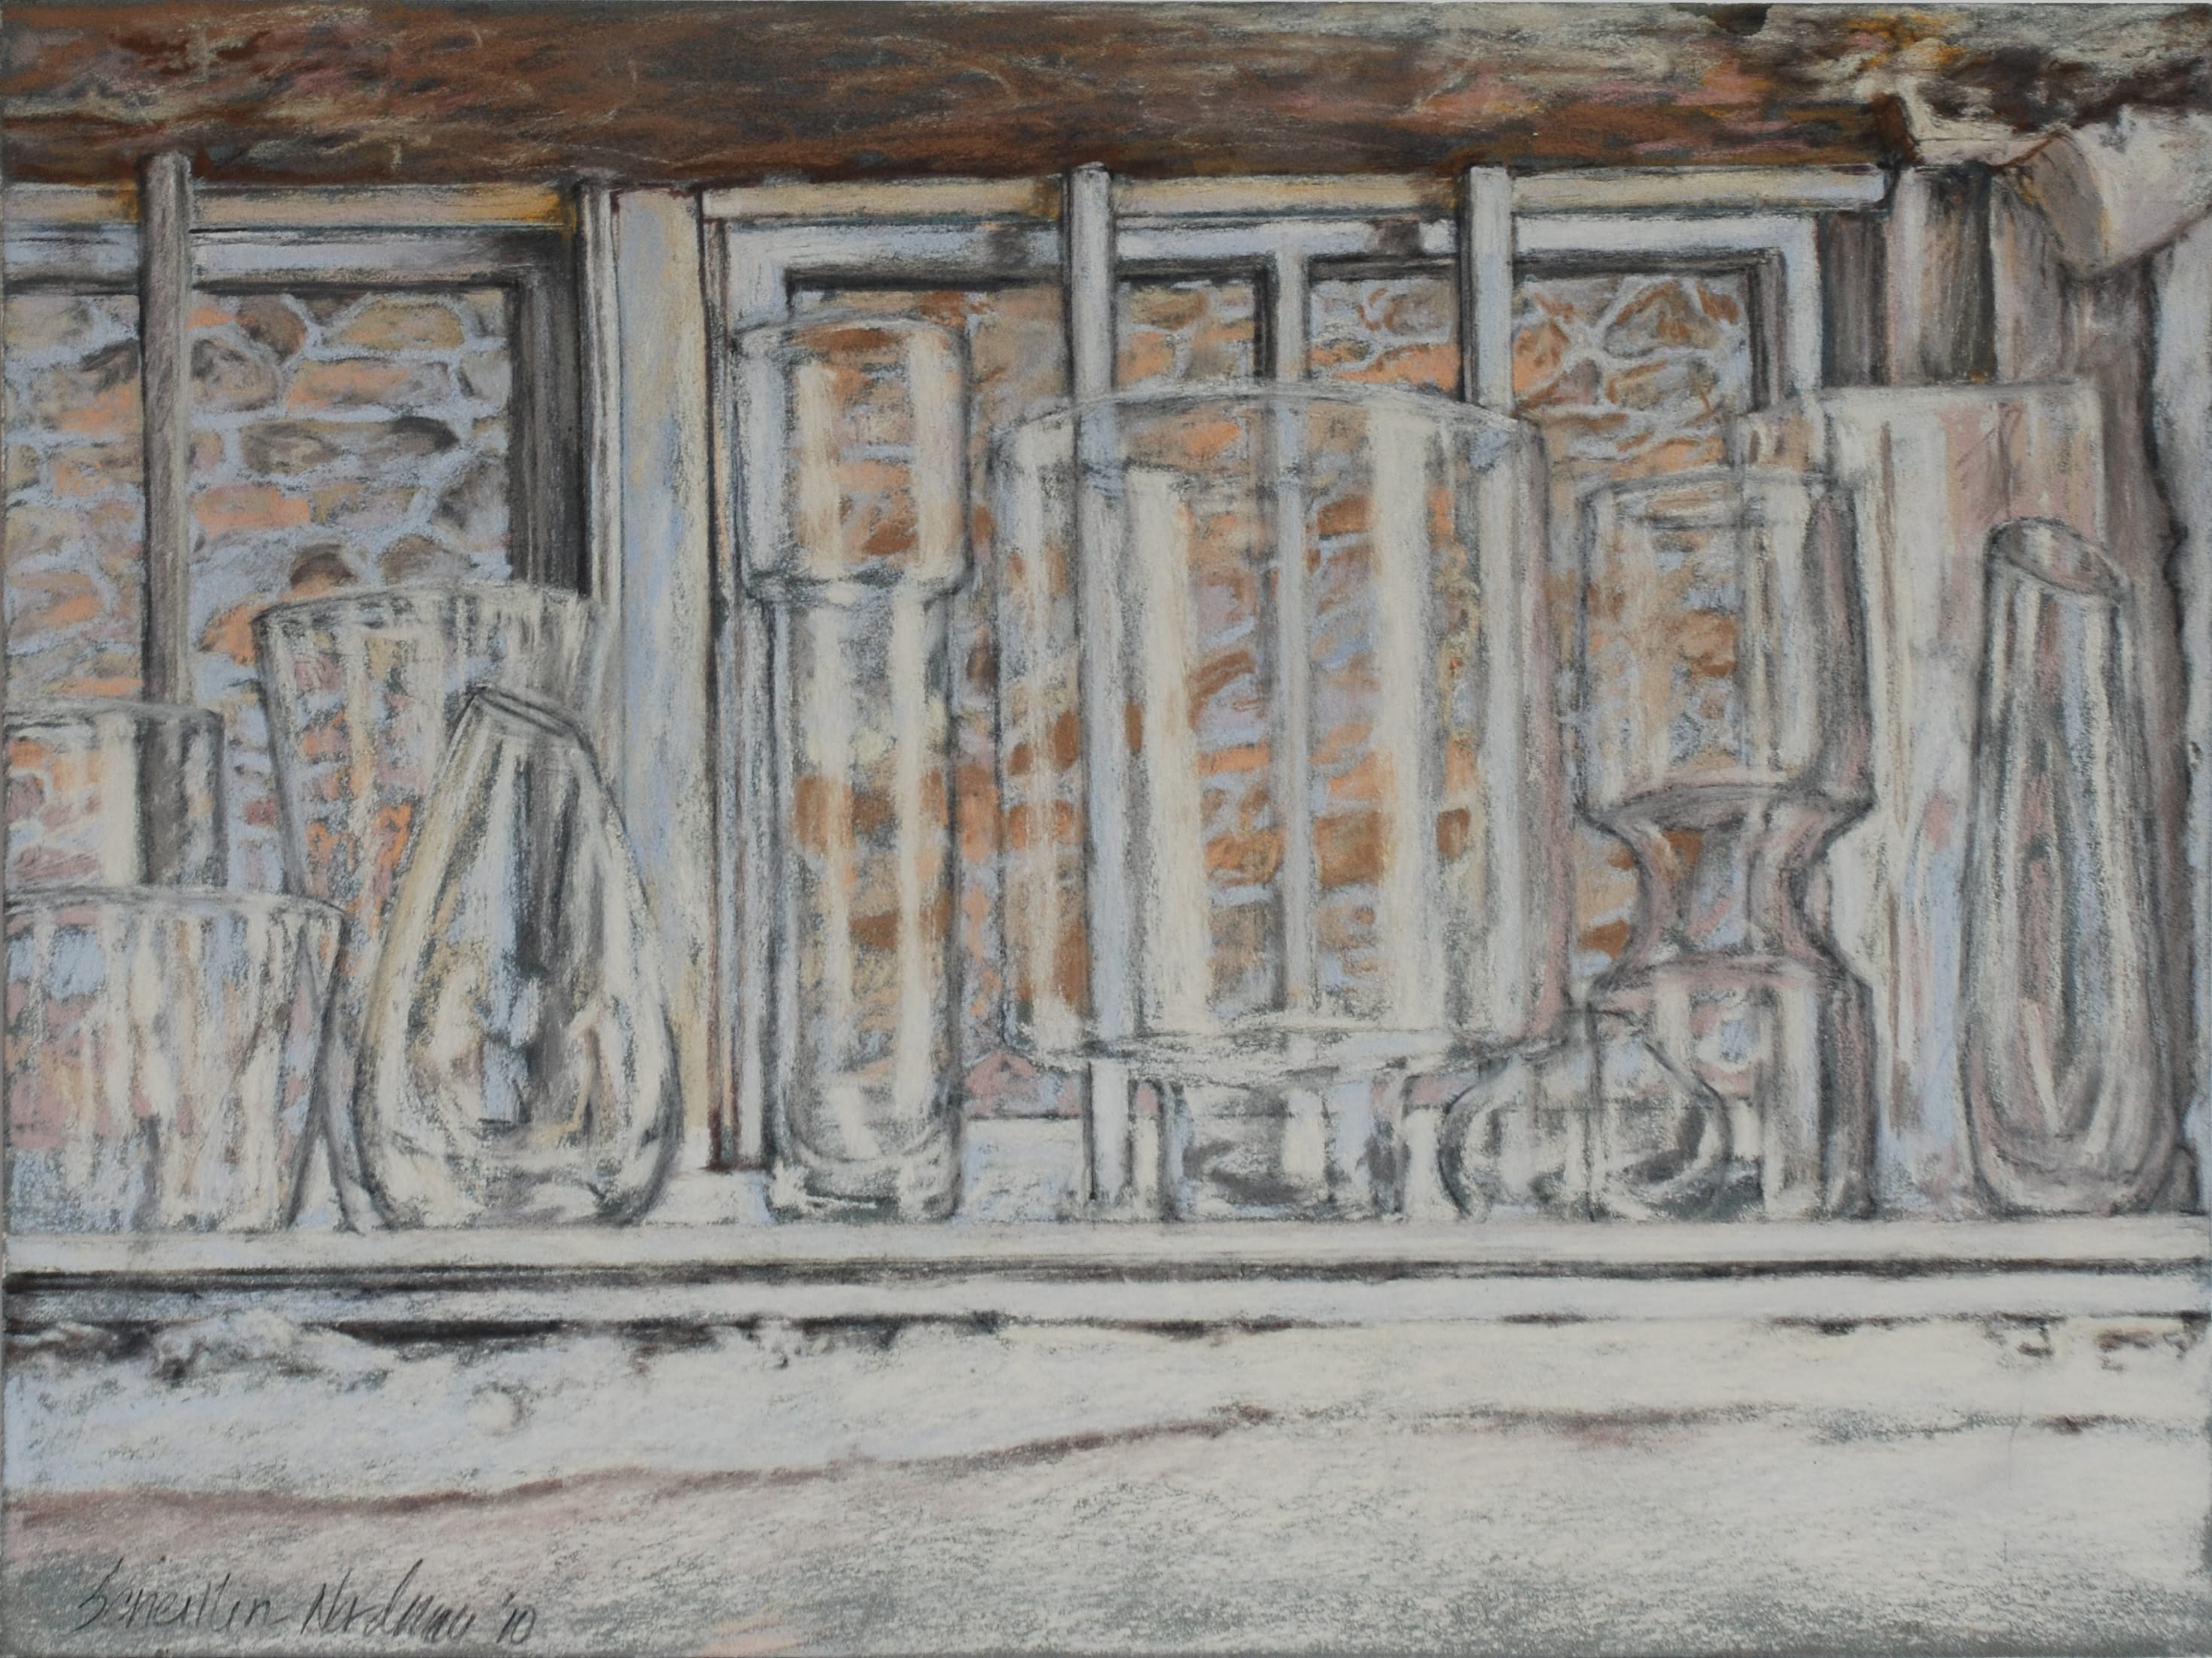 Windowsill, 2010, 30x40 cm